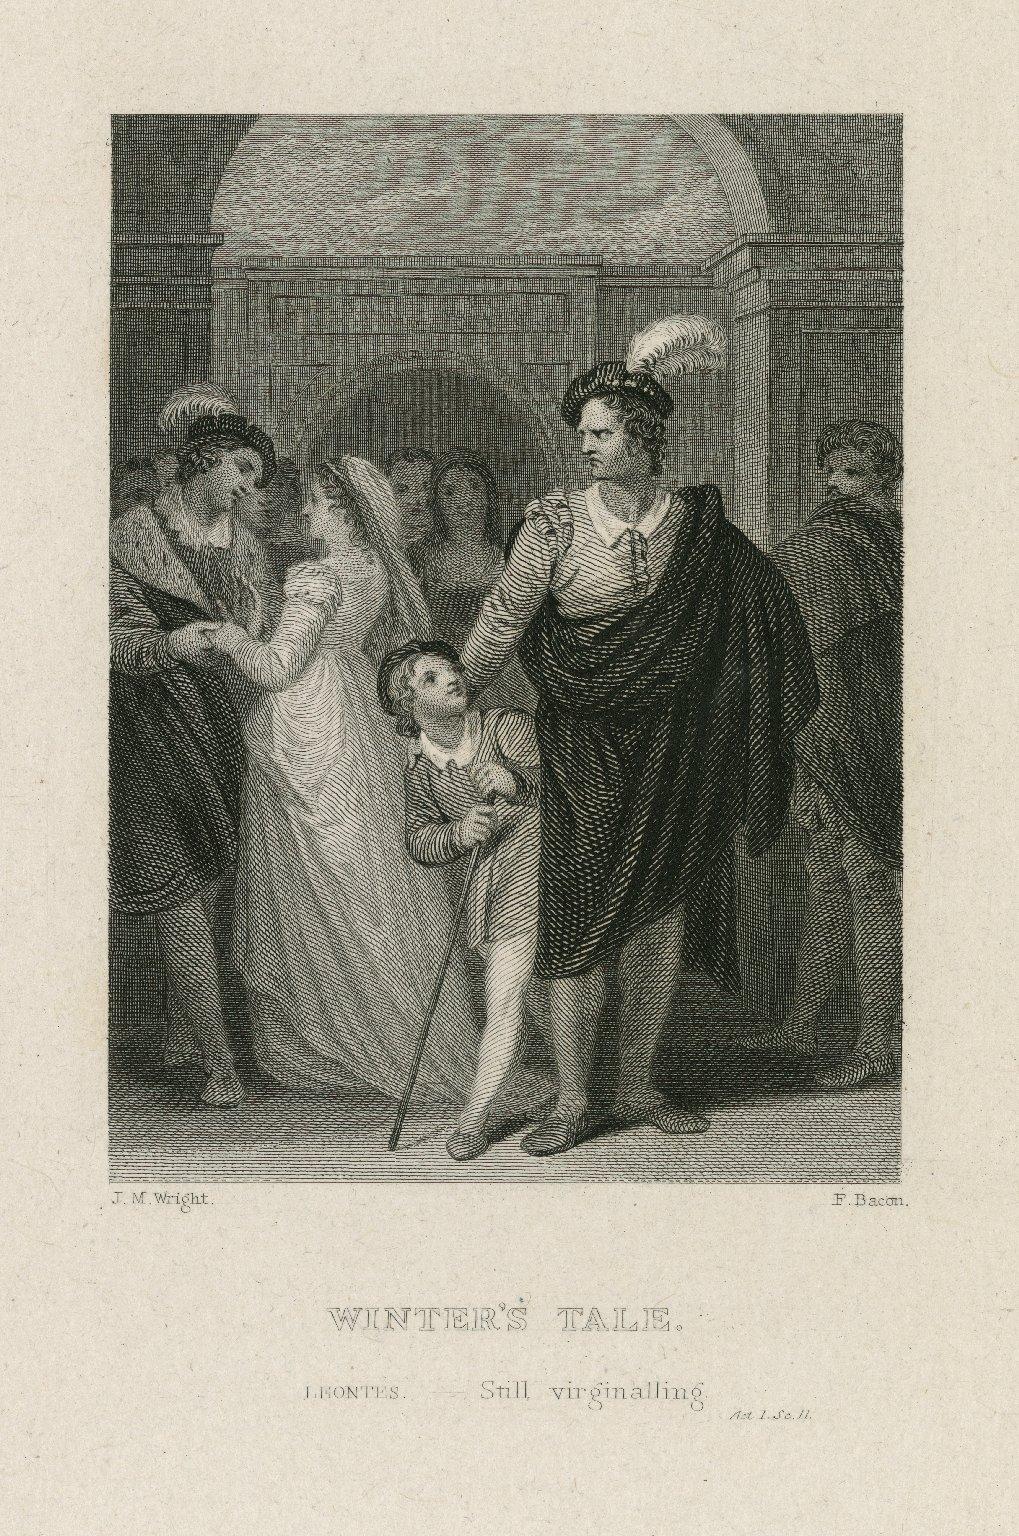 Winter's tale, Leontes: Still virginalling, act I, sc. II [graphic] / J.M. Wright ; F. Bacon.